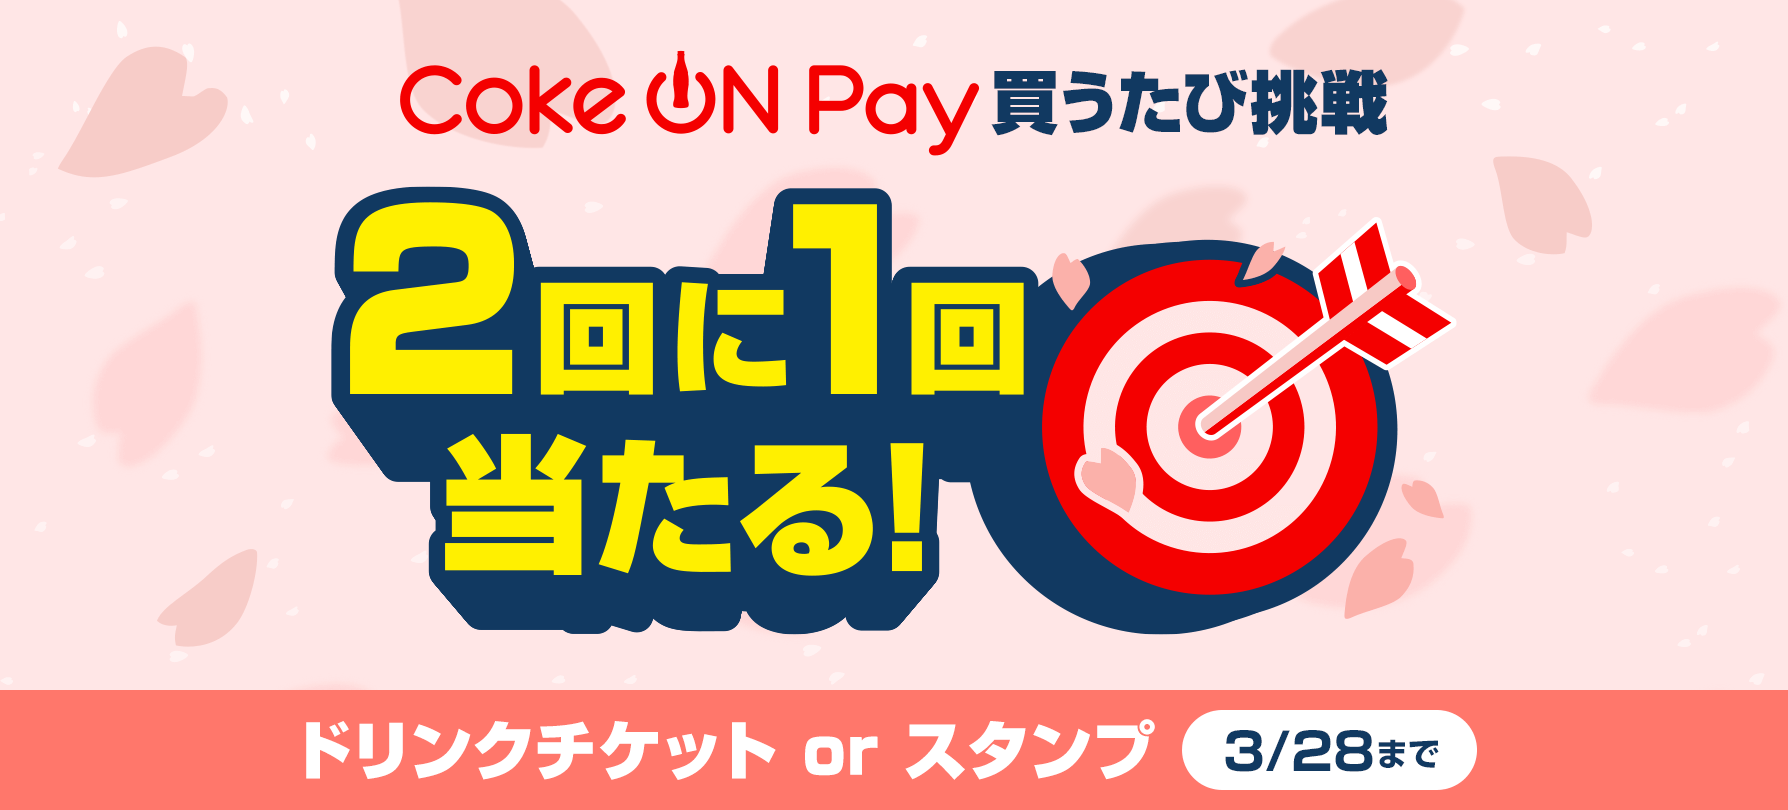 Coke ON Pay買うたび挑戦 2回に1回当たる!